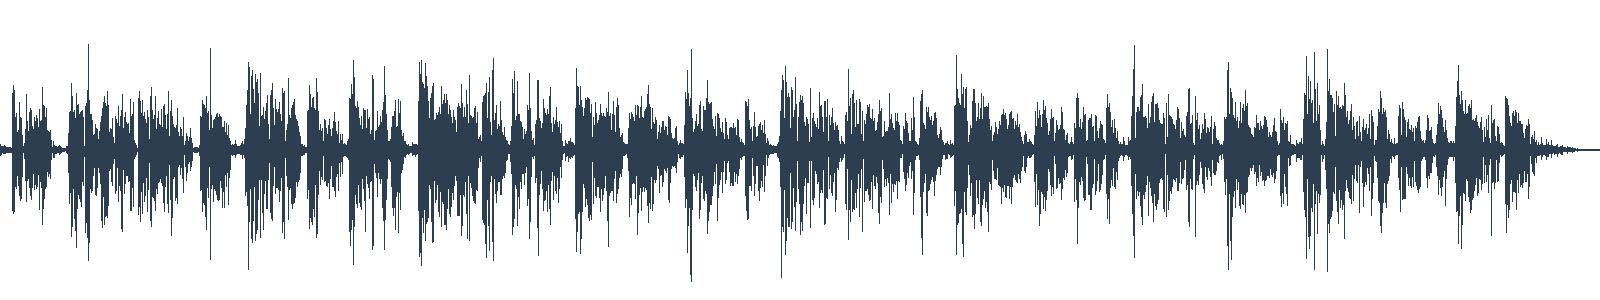 Nové audioknihy 14/2019 waveform